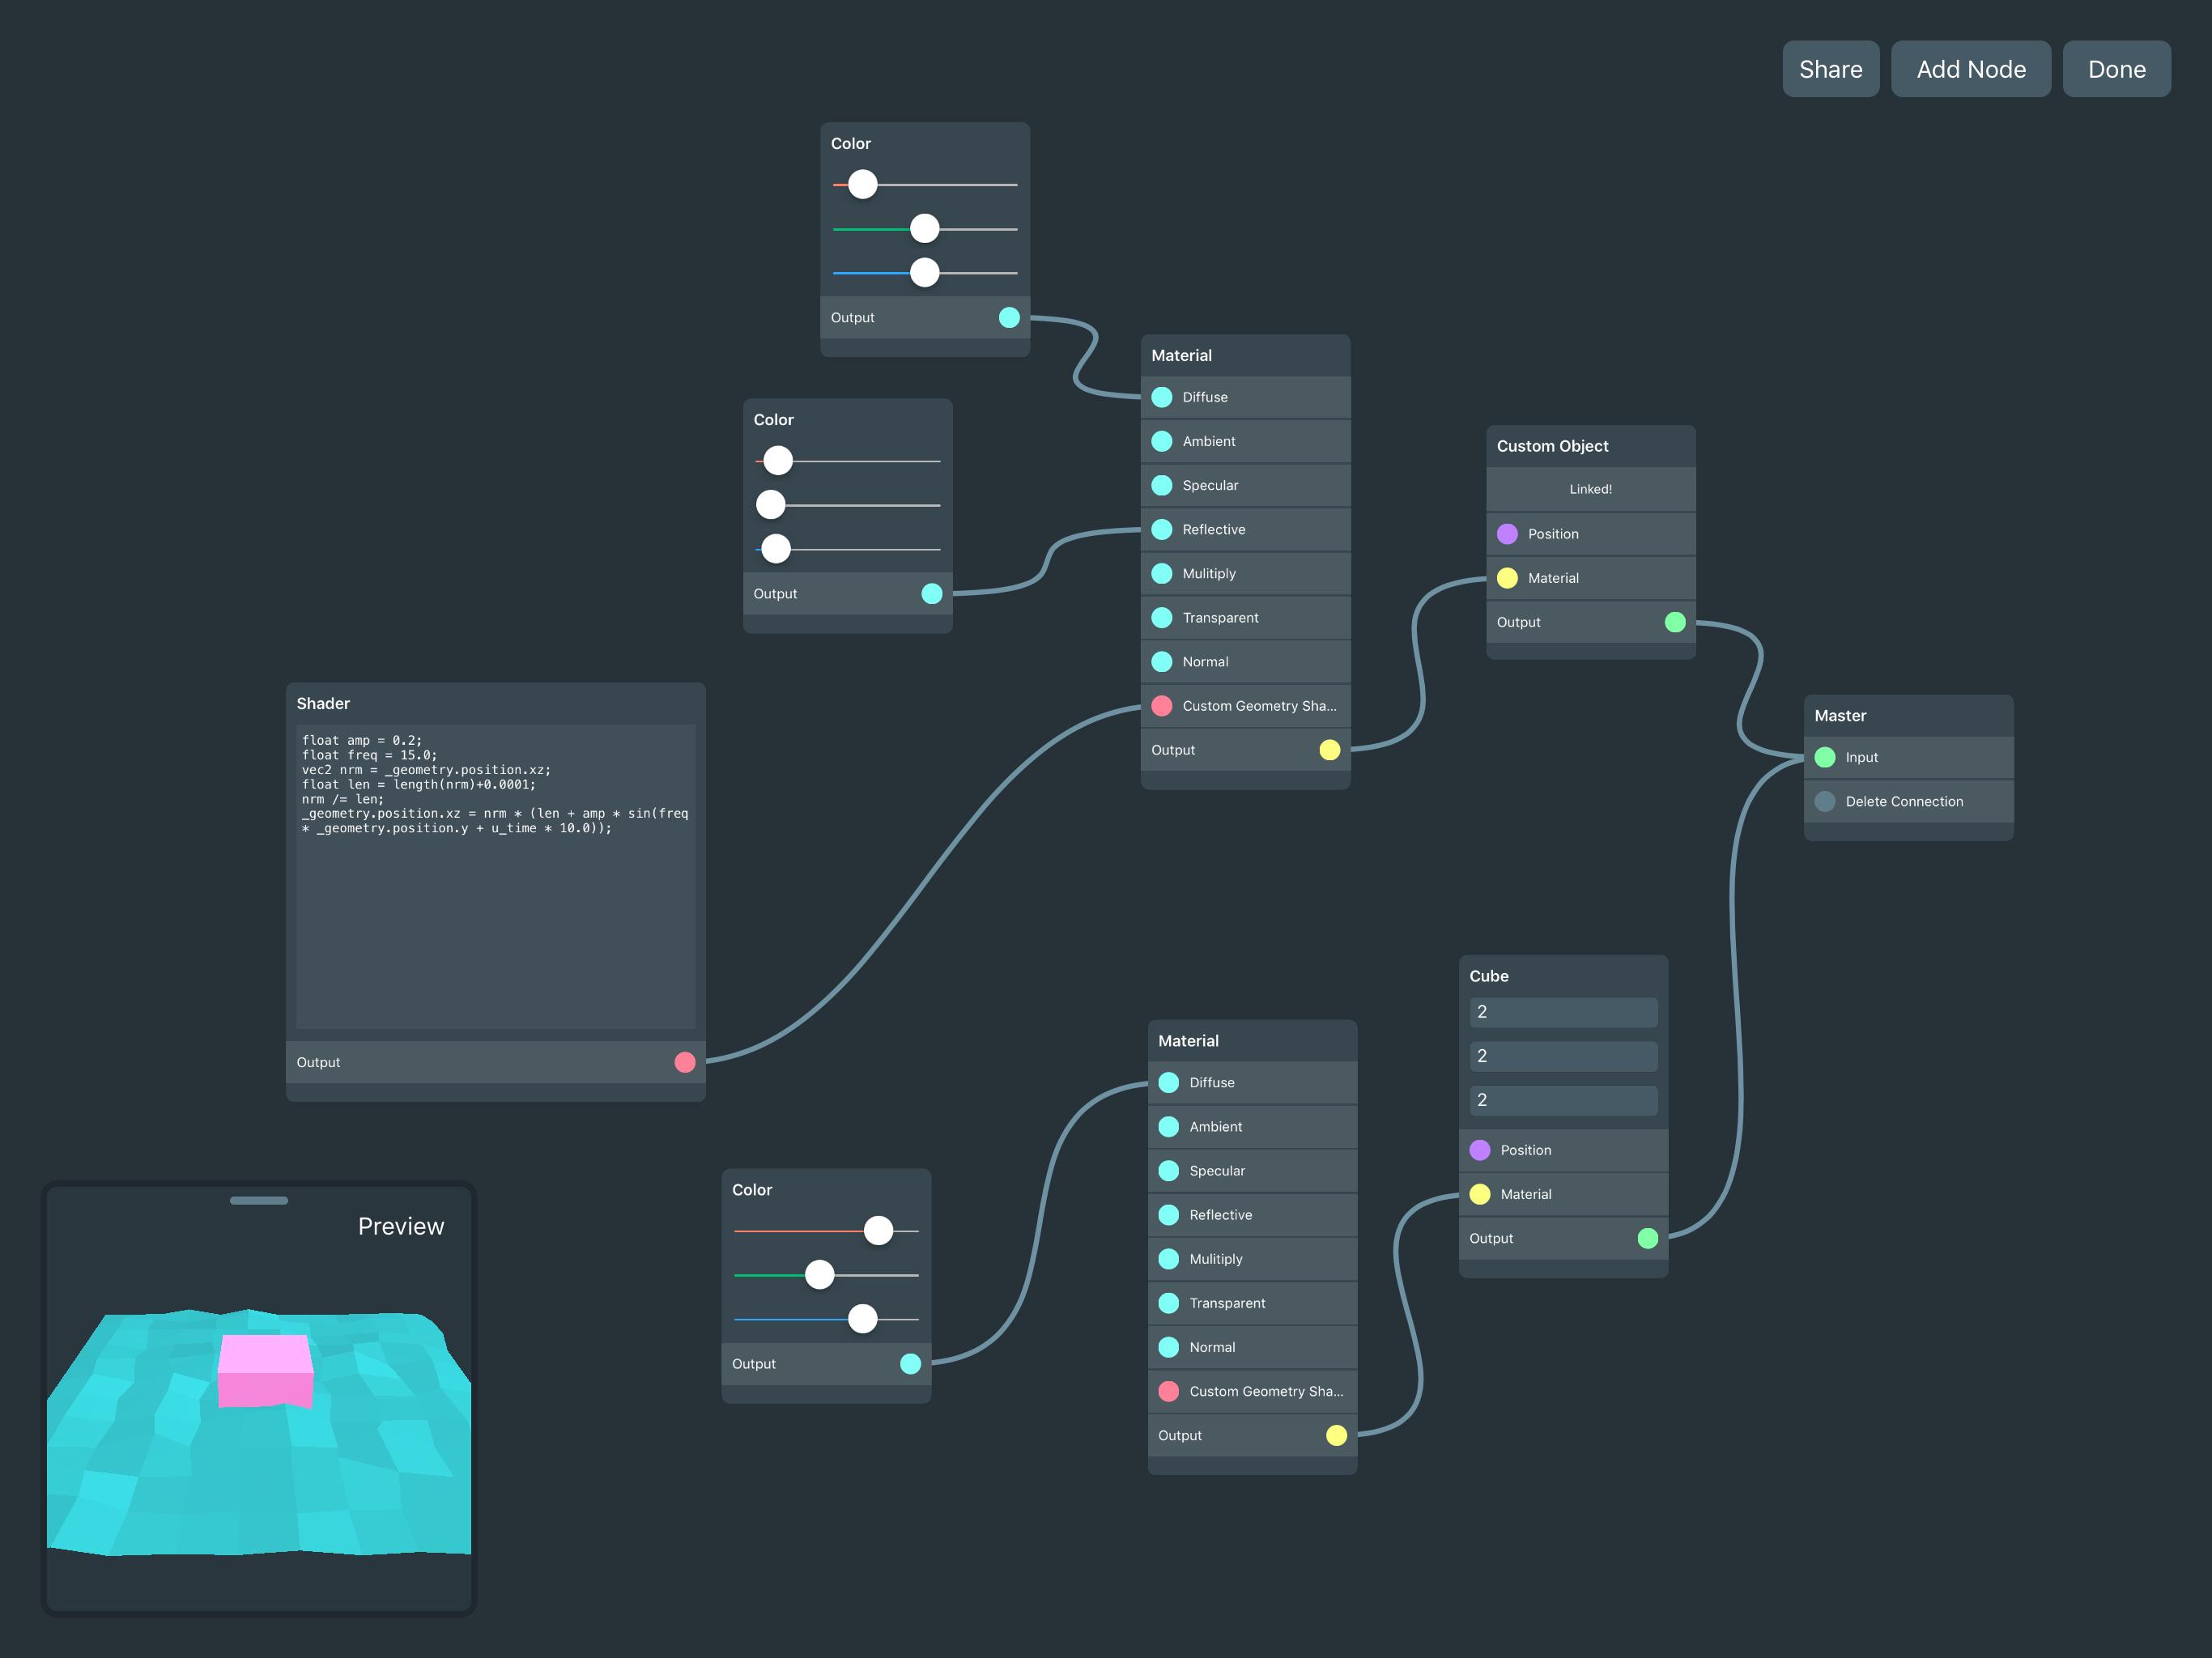 Yttrium - Quickly design AR and 3D prototypes on iOS